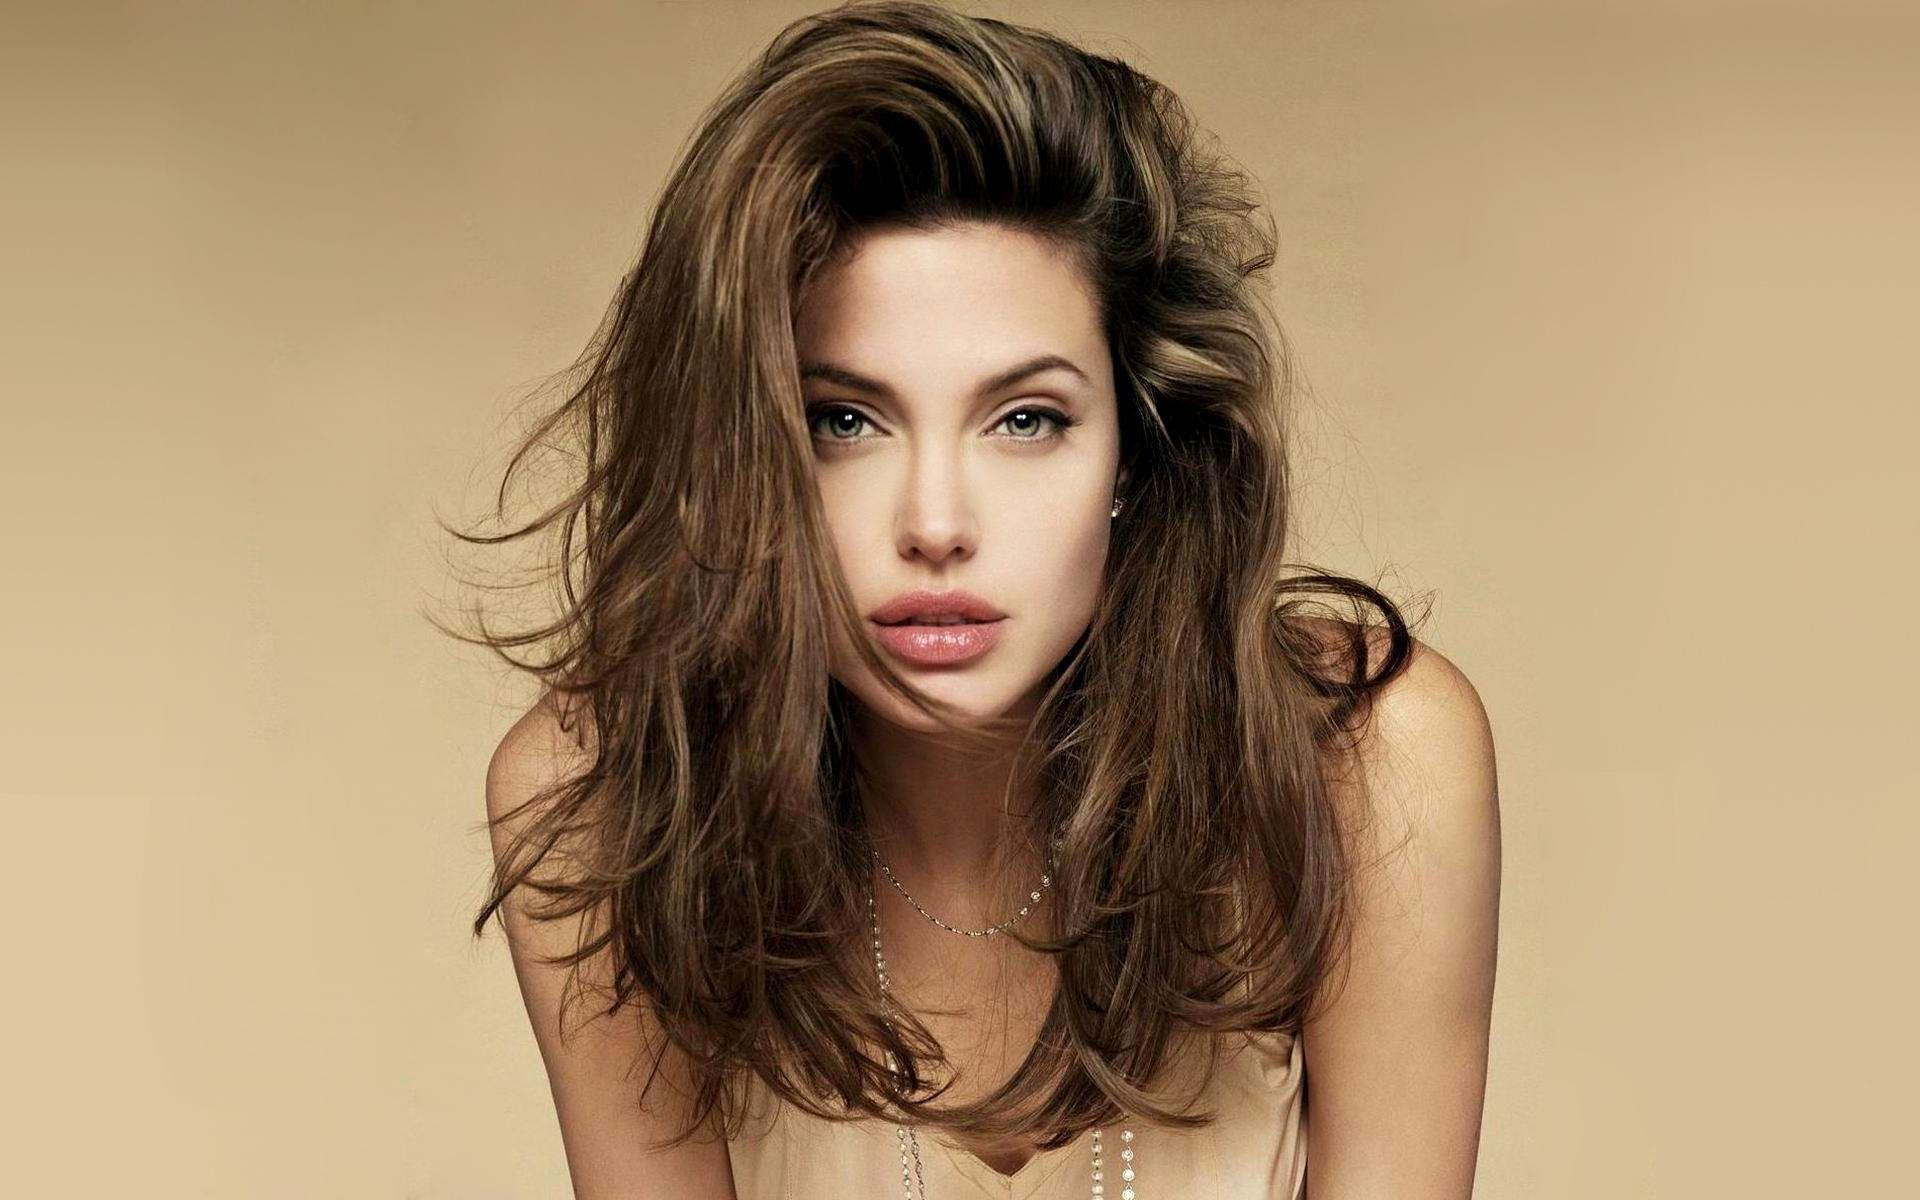 Angelina Jolie Celeb Exclusive HD Wallpapers 3827 1920x1200